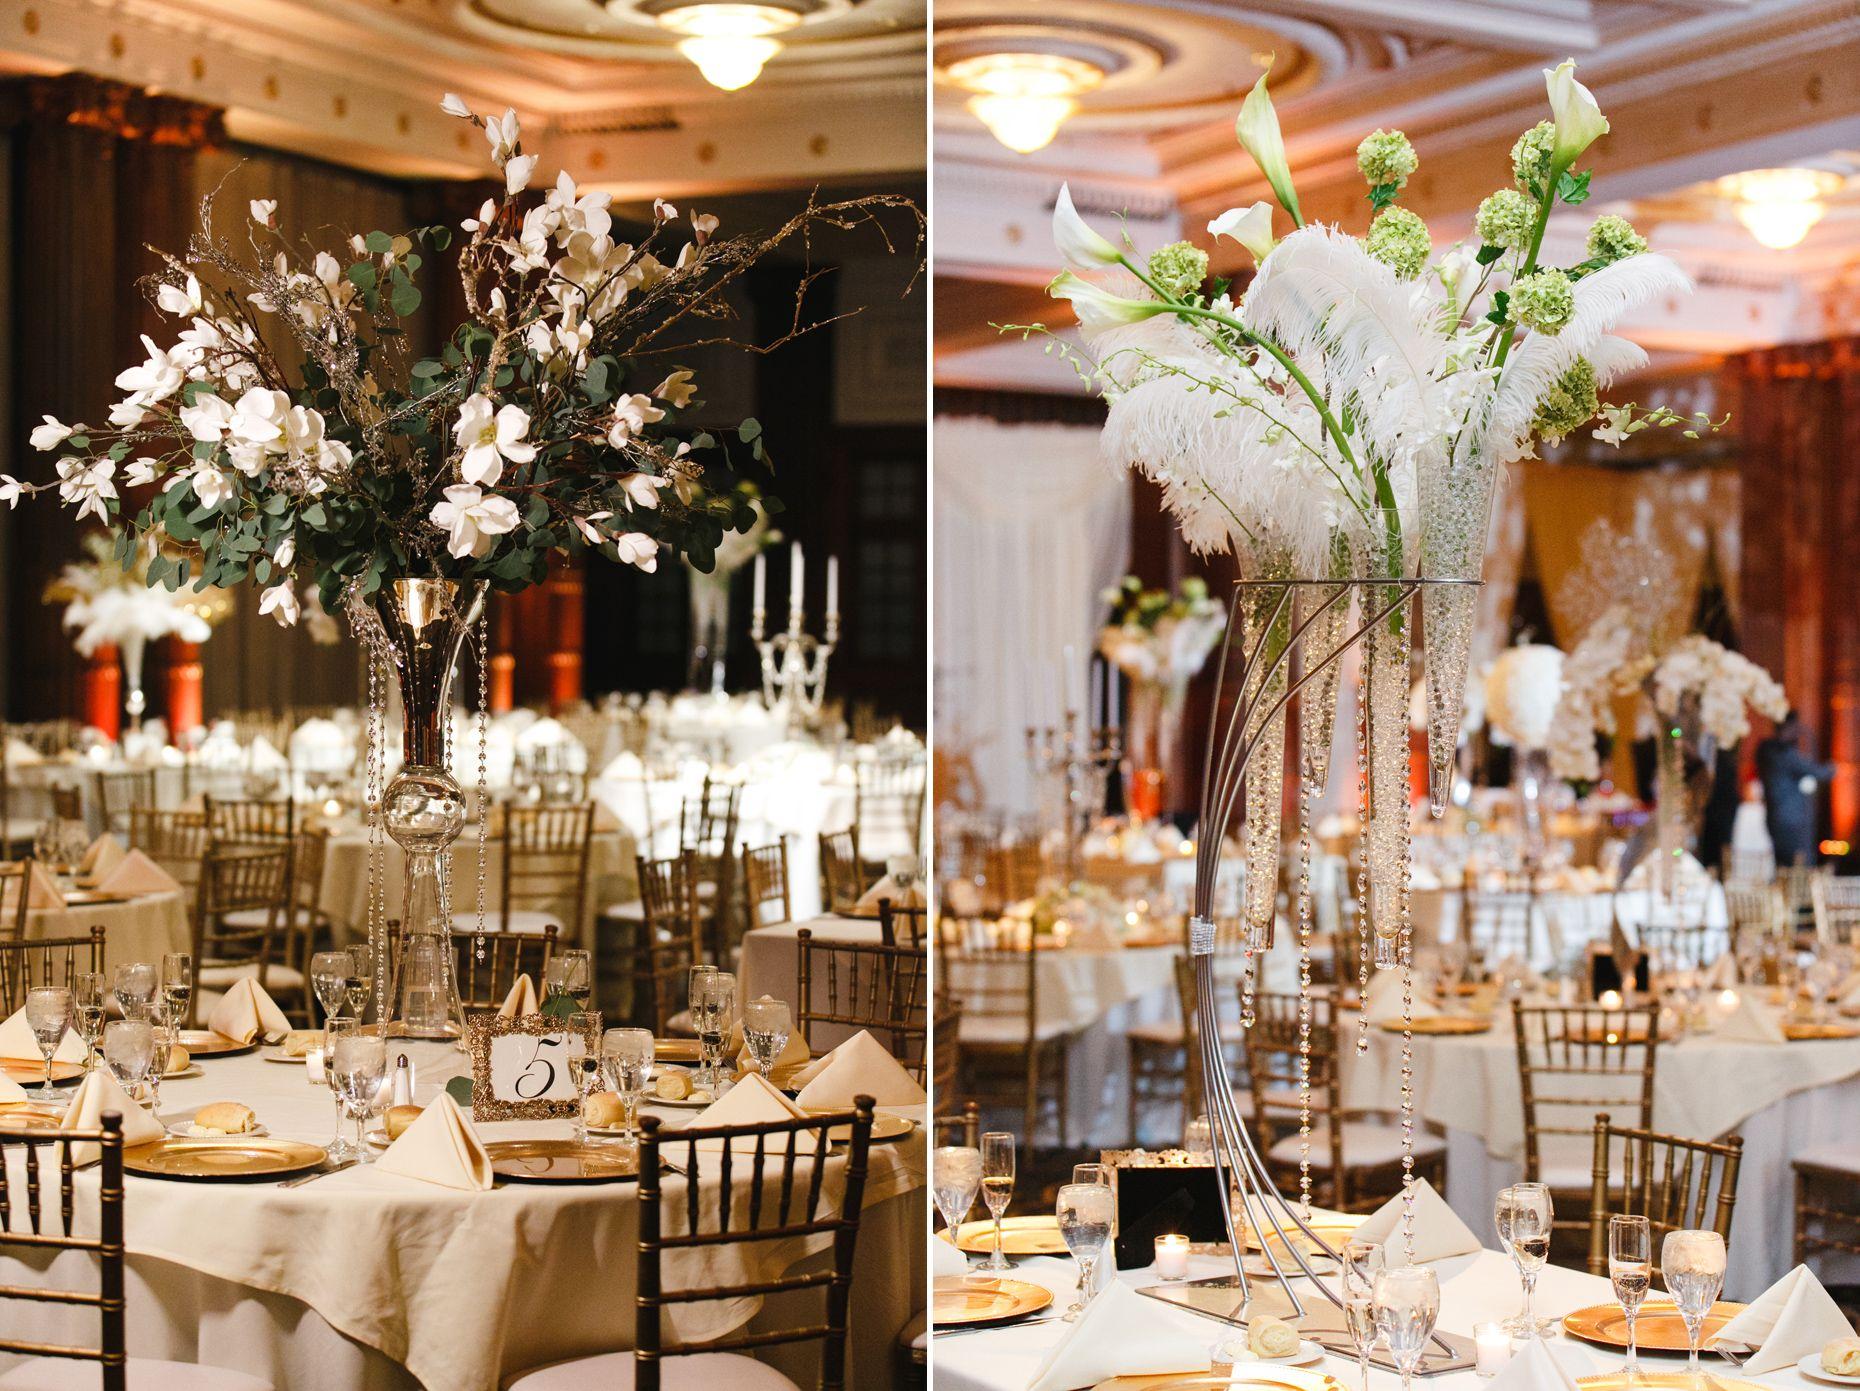 Crystal Tea Room Wedding By Two17 Photo Cinema Natural Wedding Decor Tea Room Catering Design